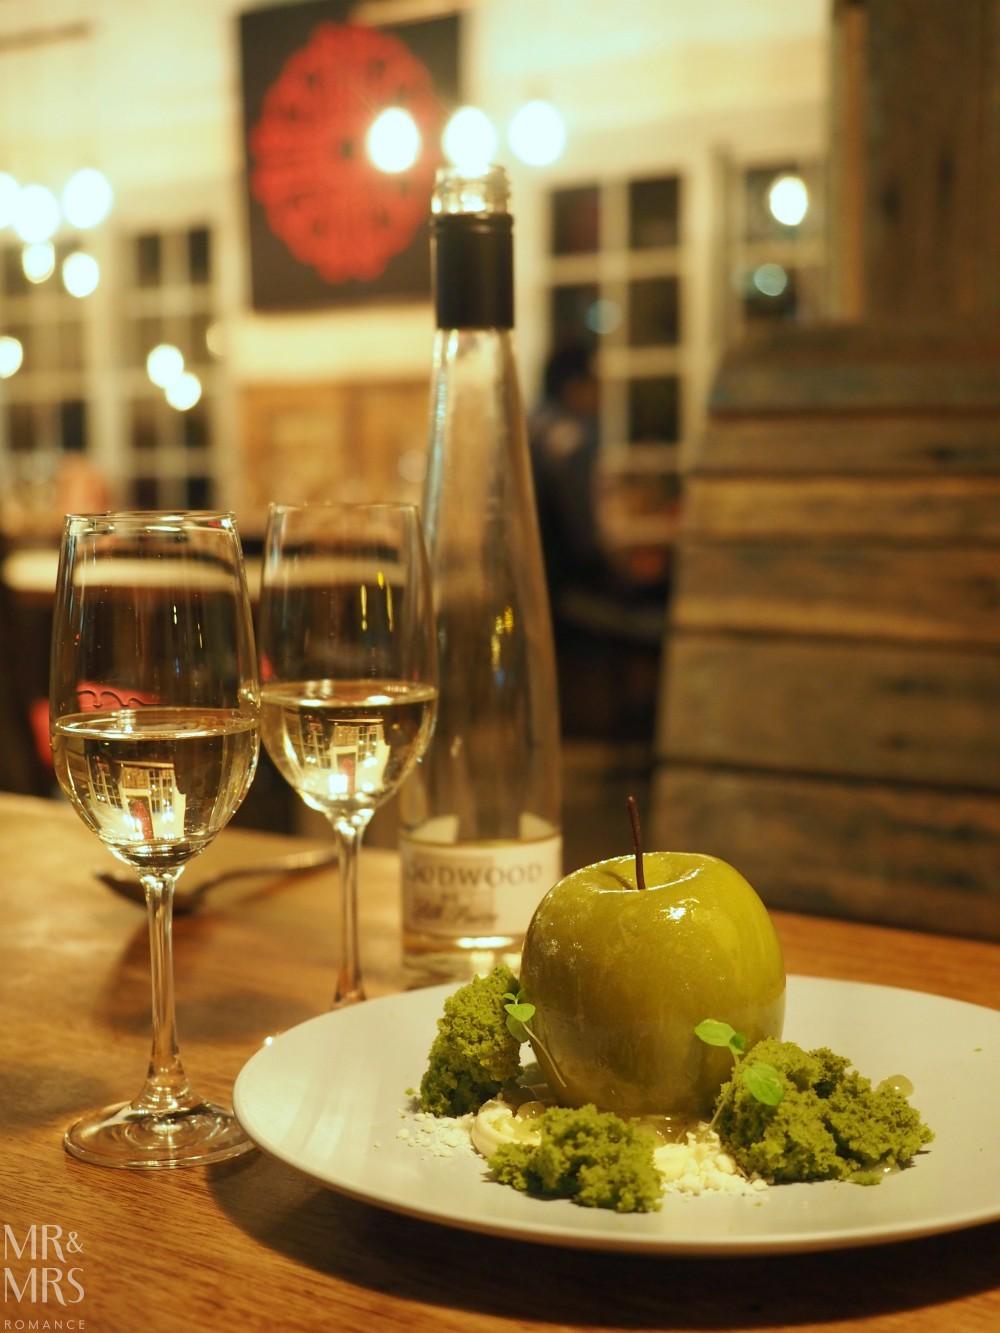 Orange Wine Festival - Charred The Apple dessert